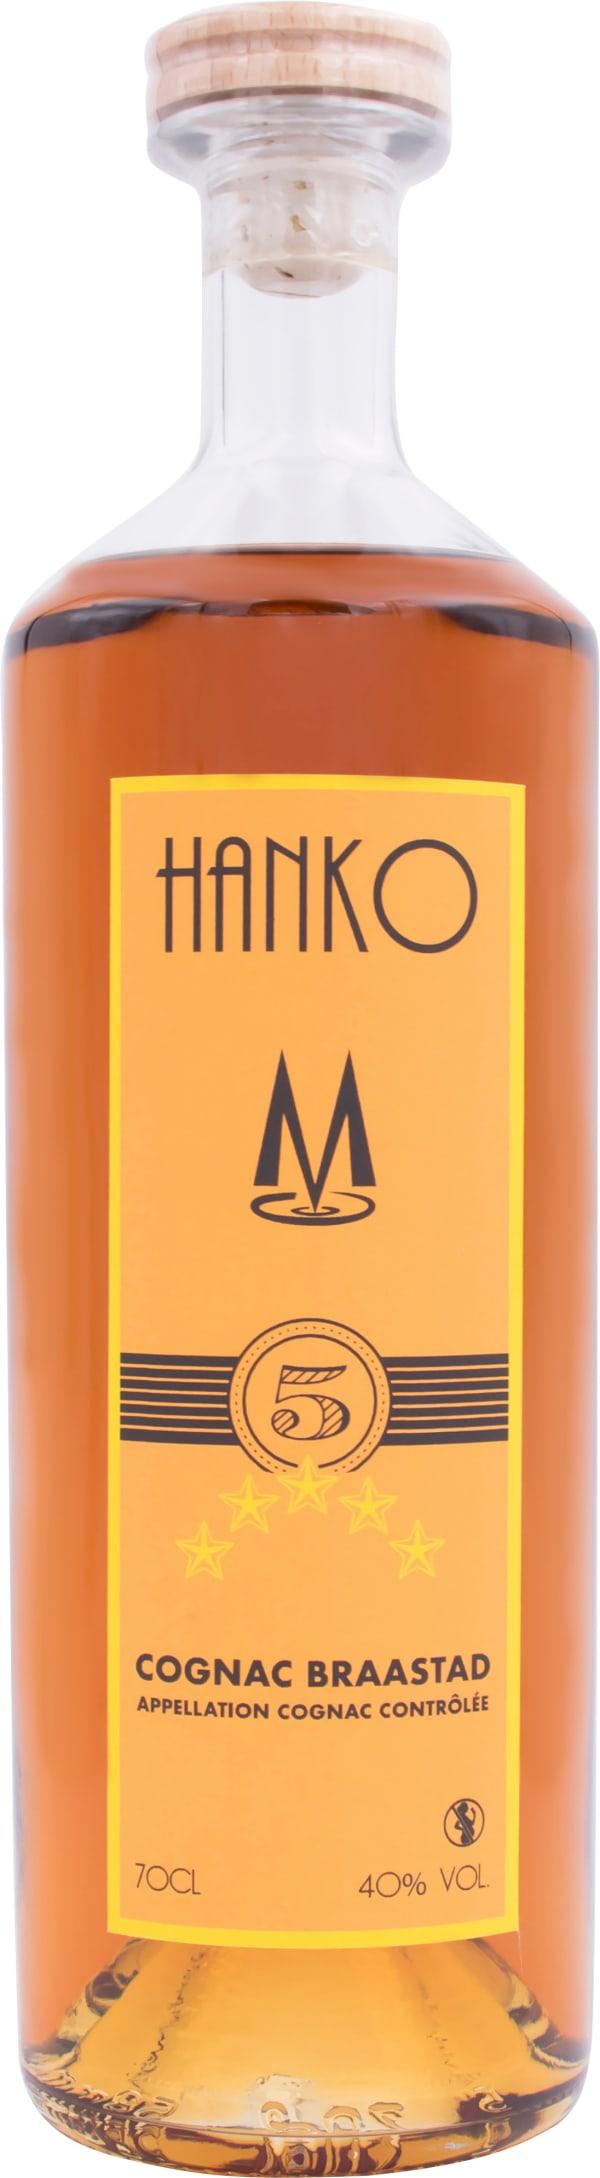 Hanko 5 Star Cognac Braastad